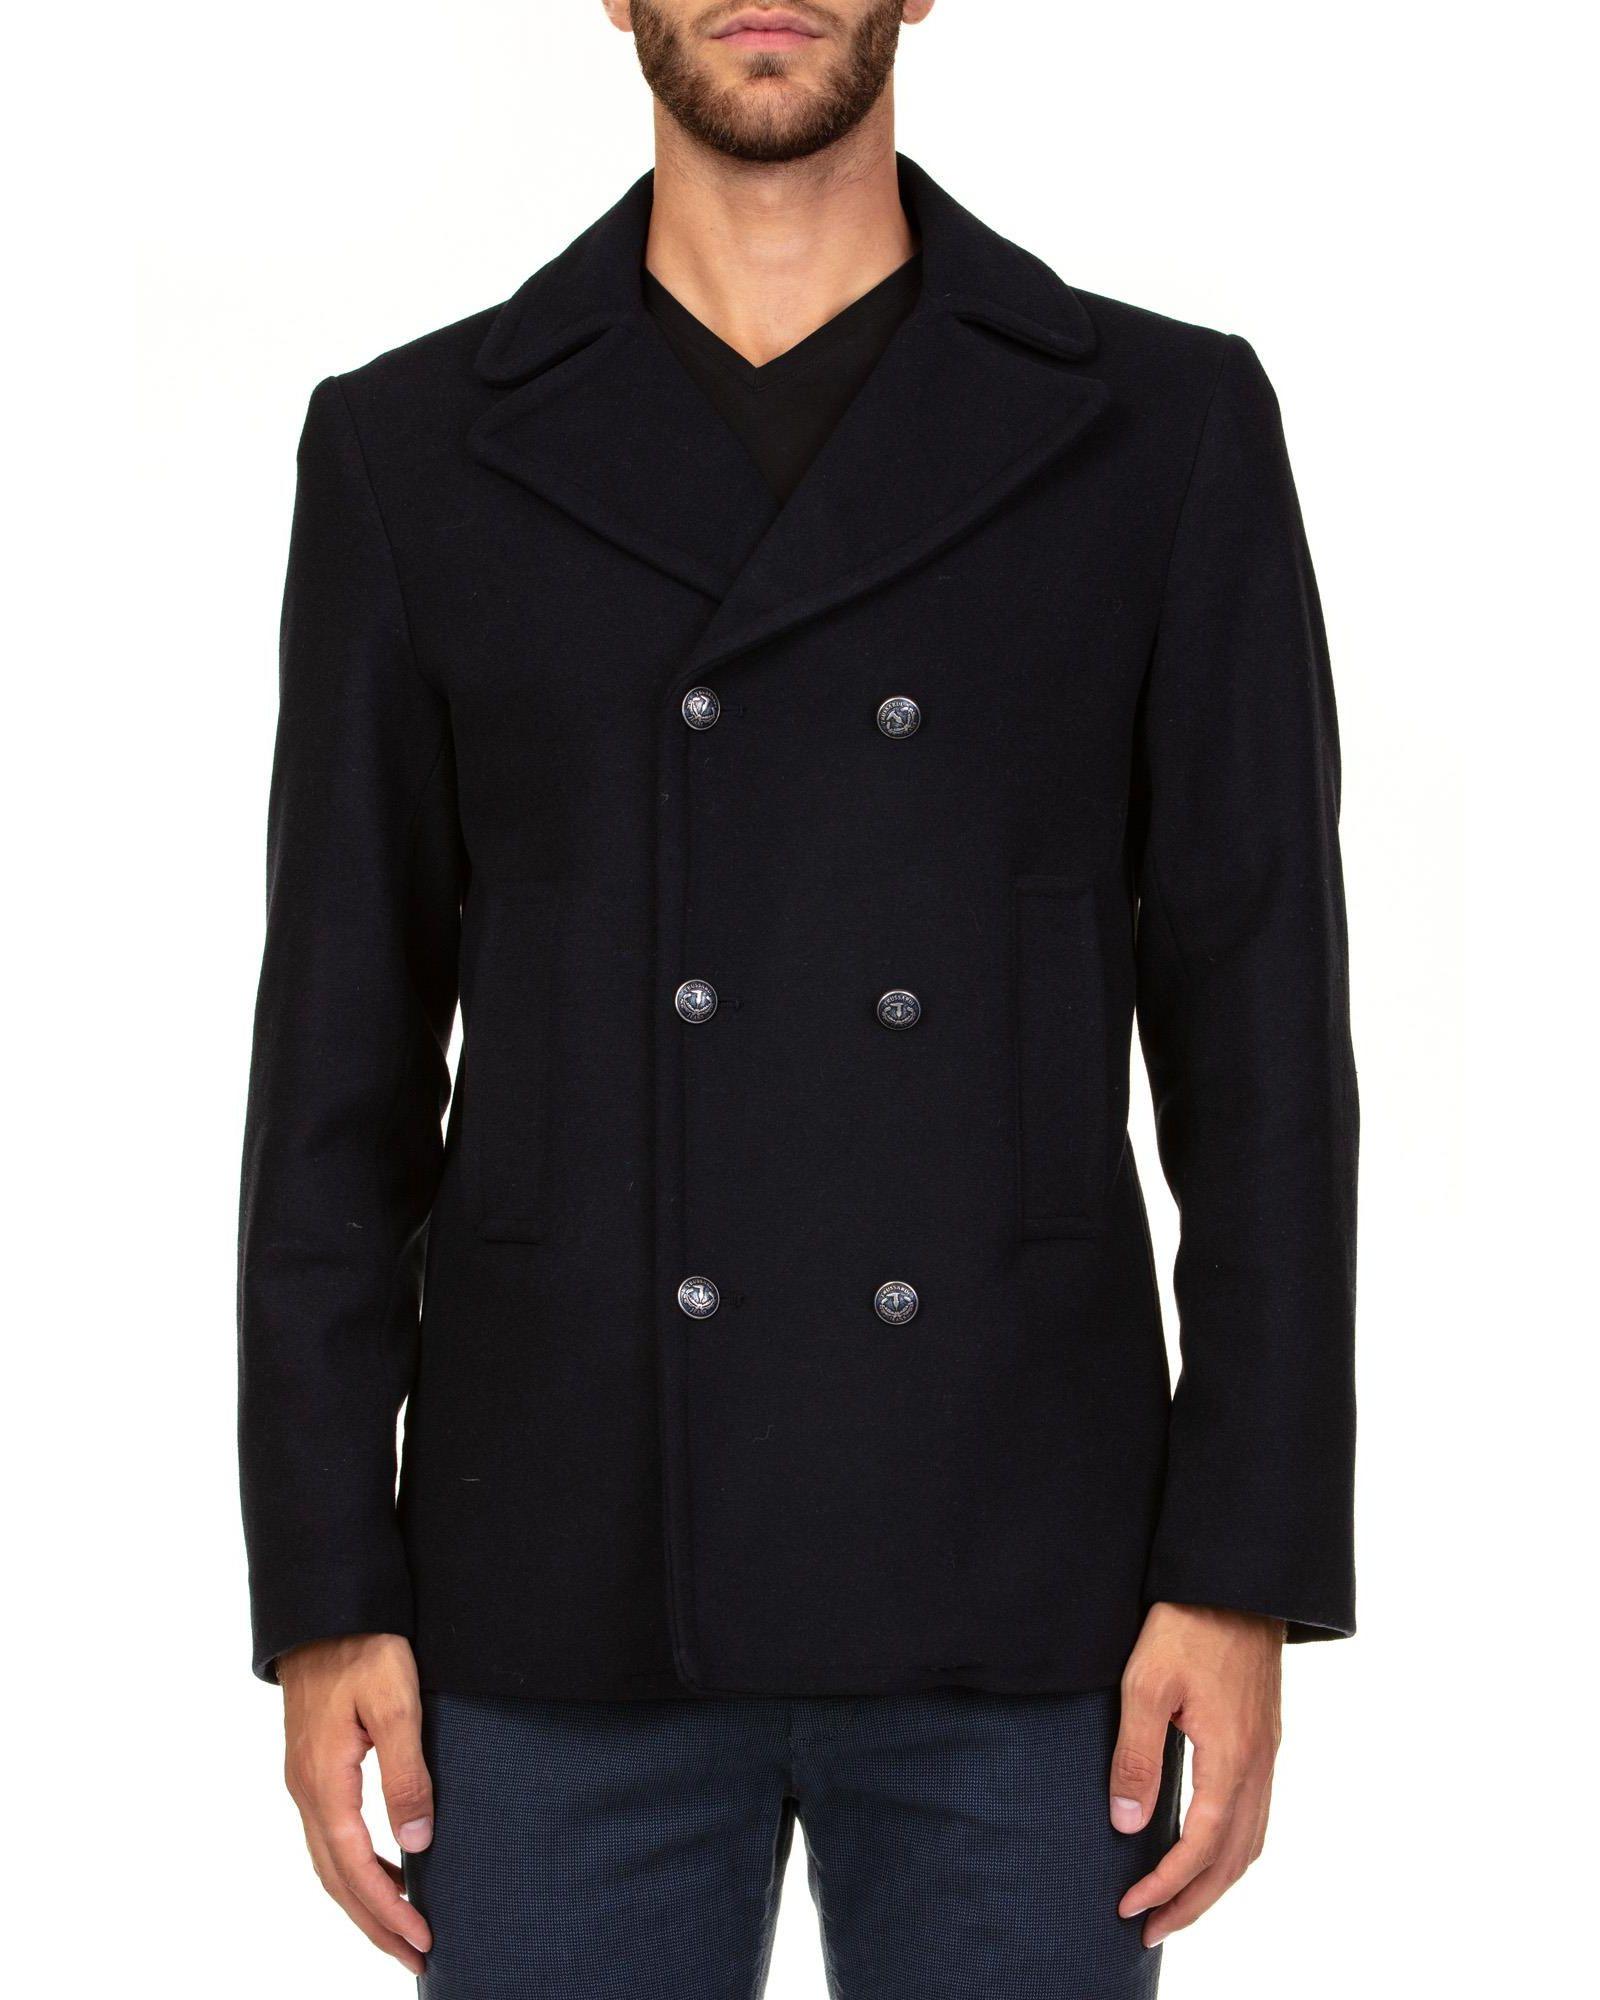 TRUSSARDI Wool Blend Coat in Blue